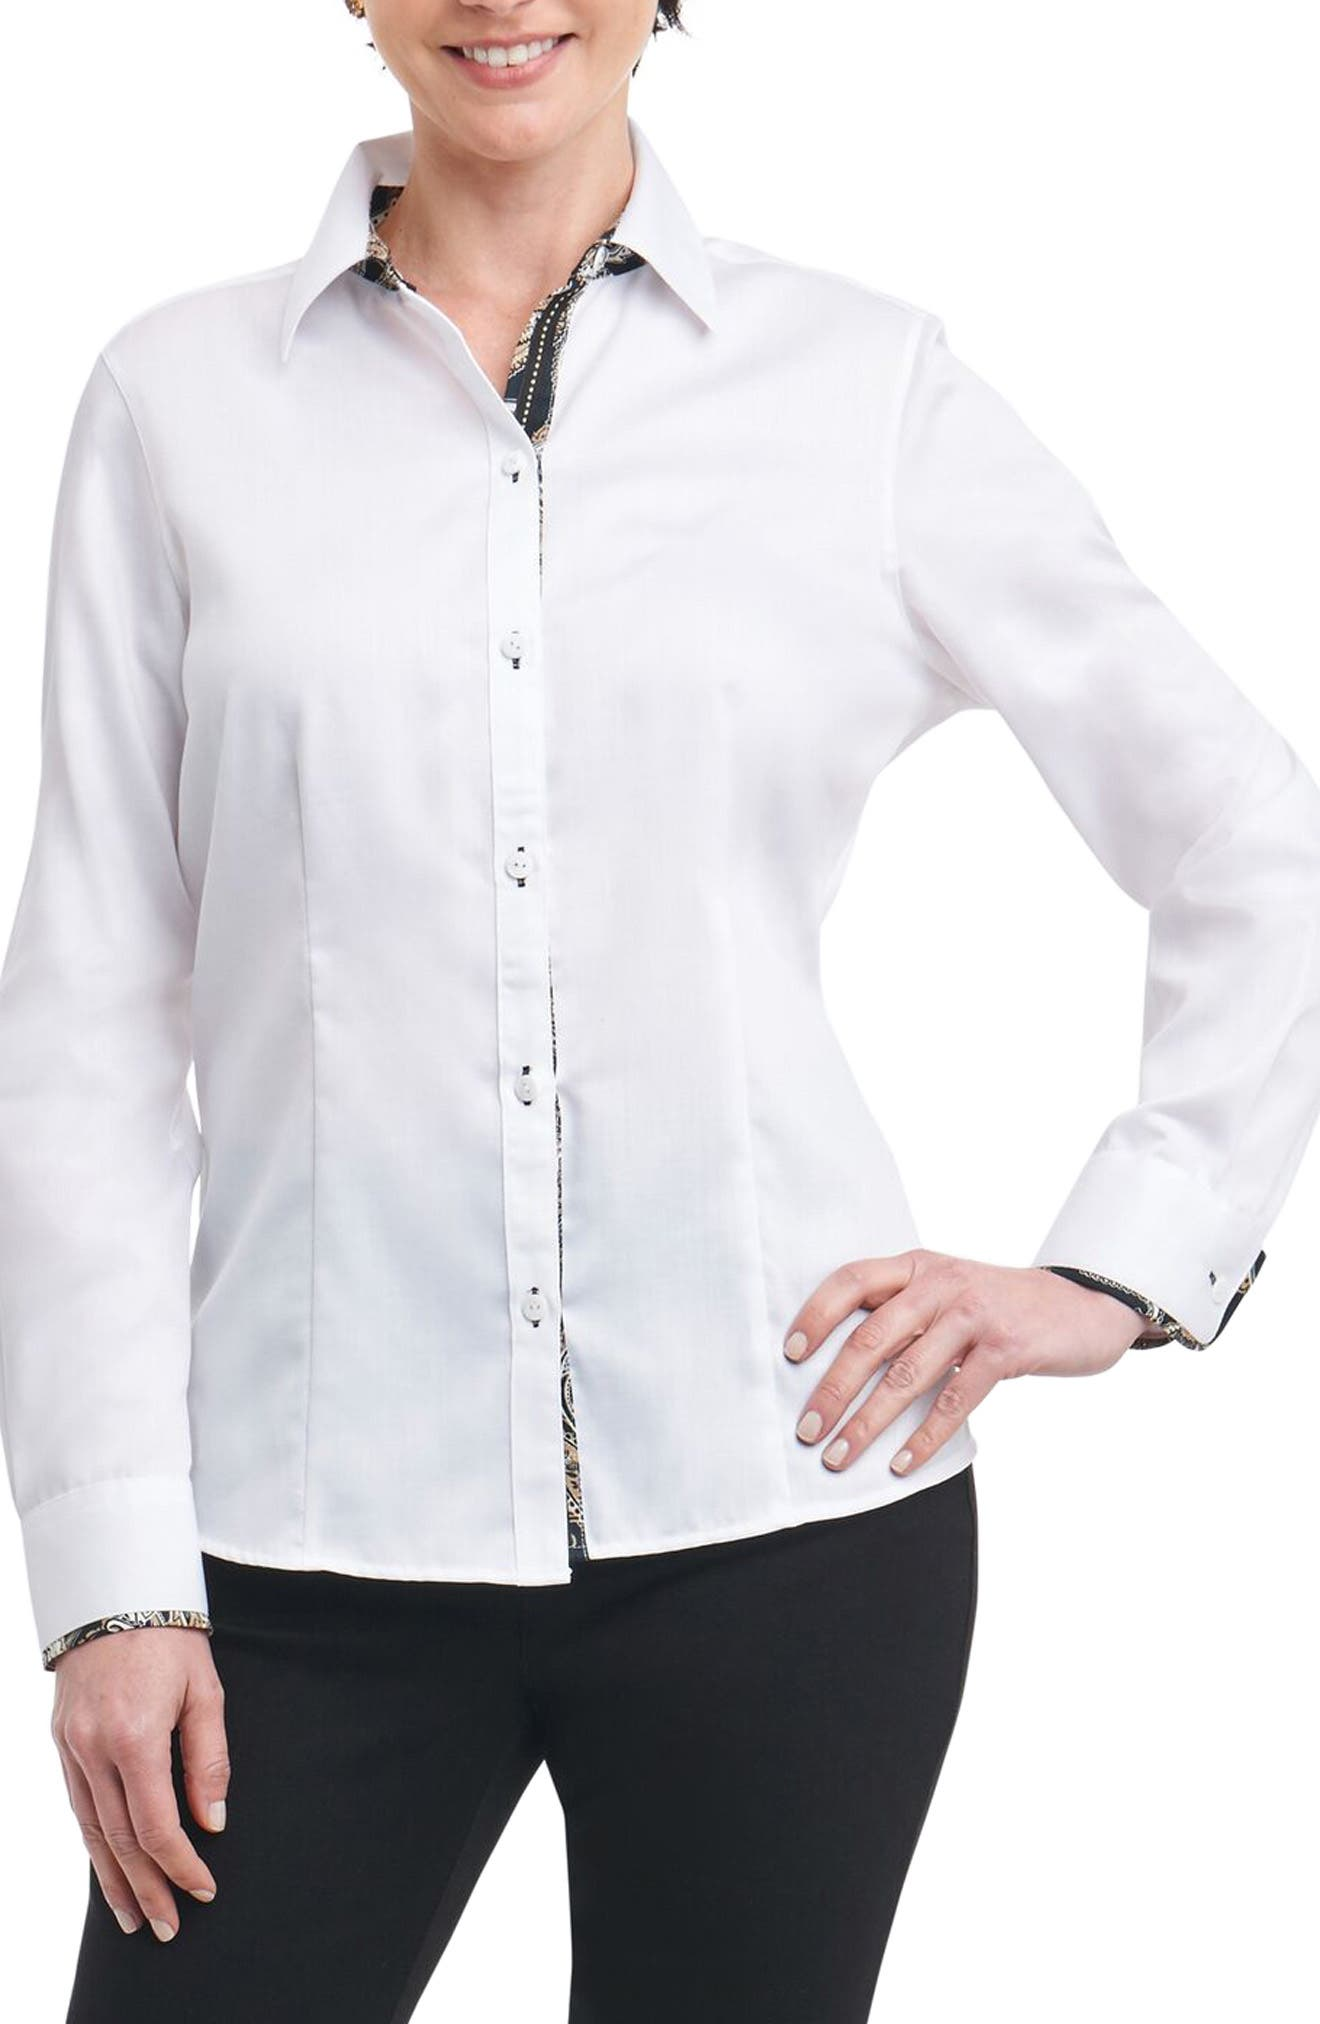 Foxcroft Brooke Contrast Trim Sateen Shirt